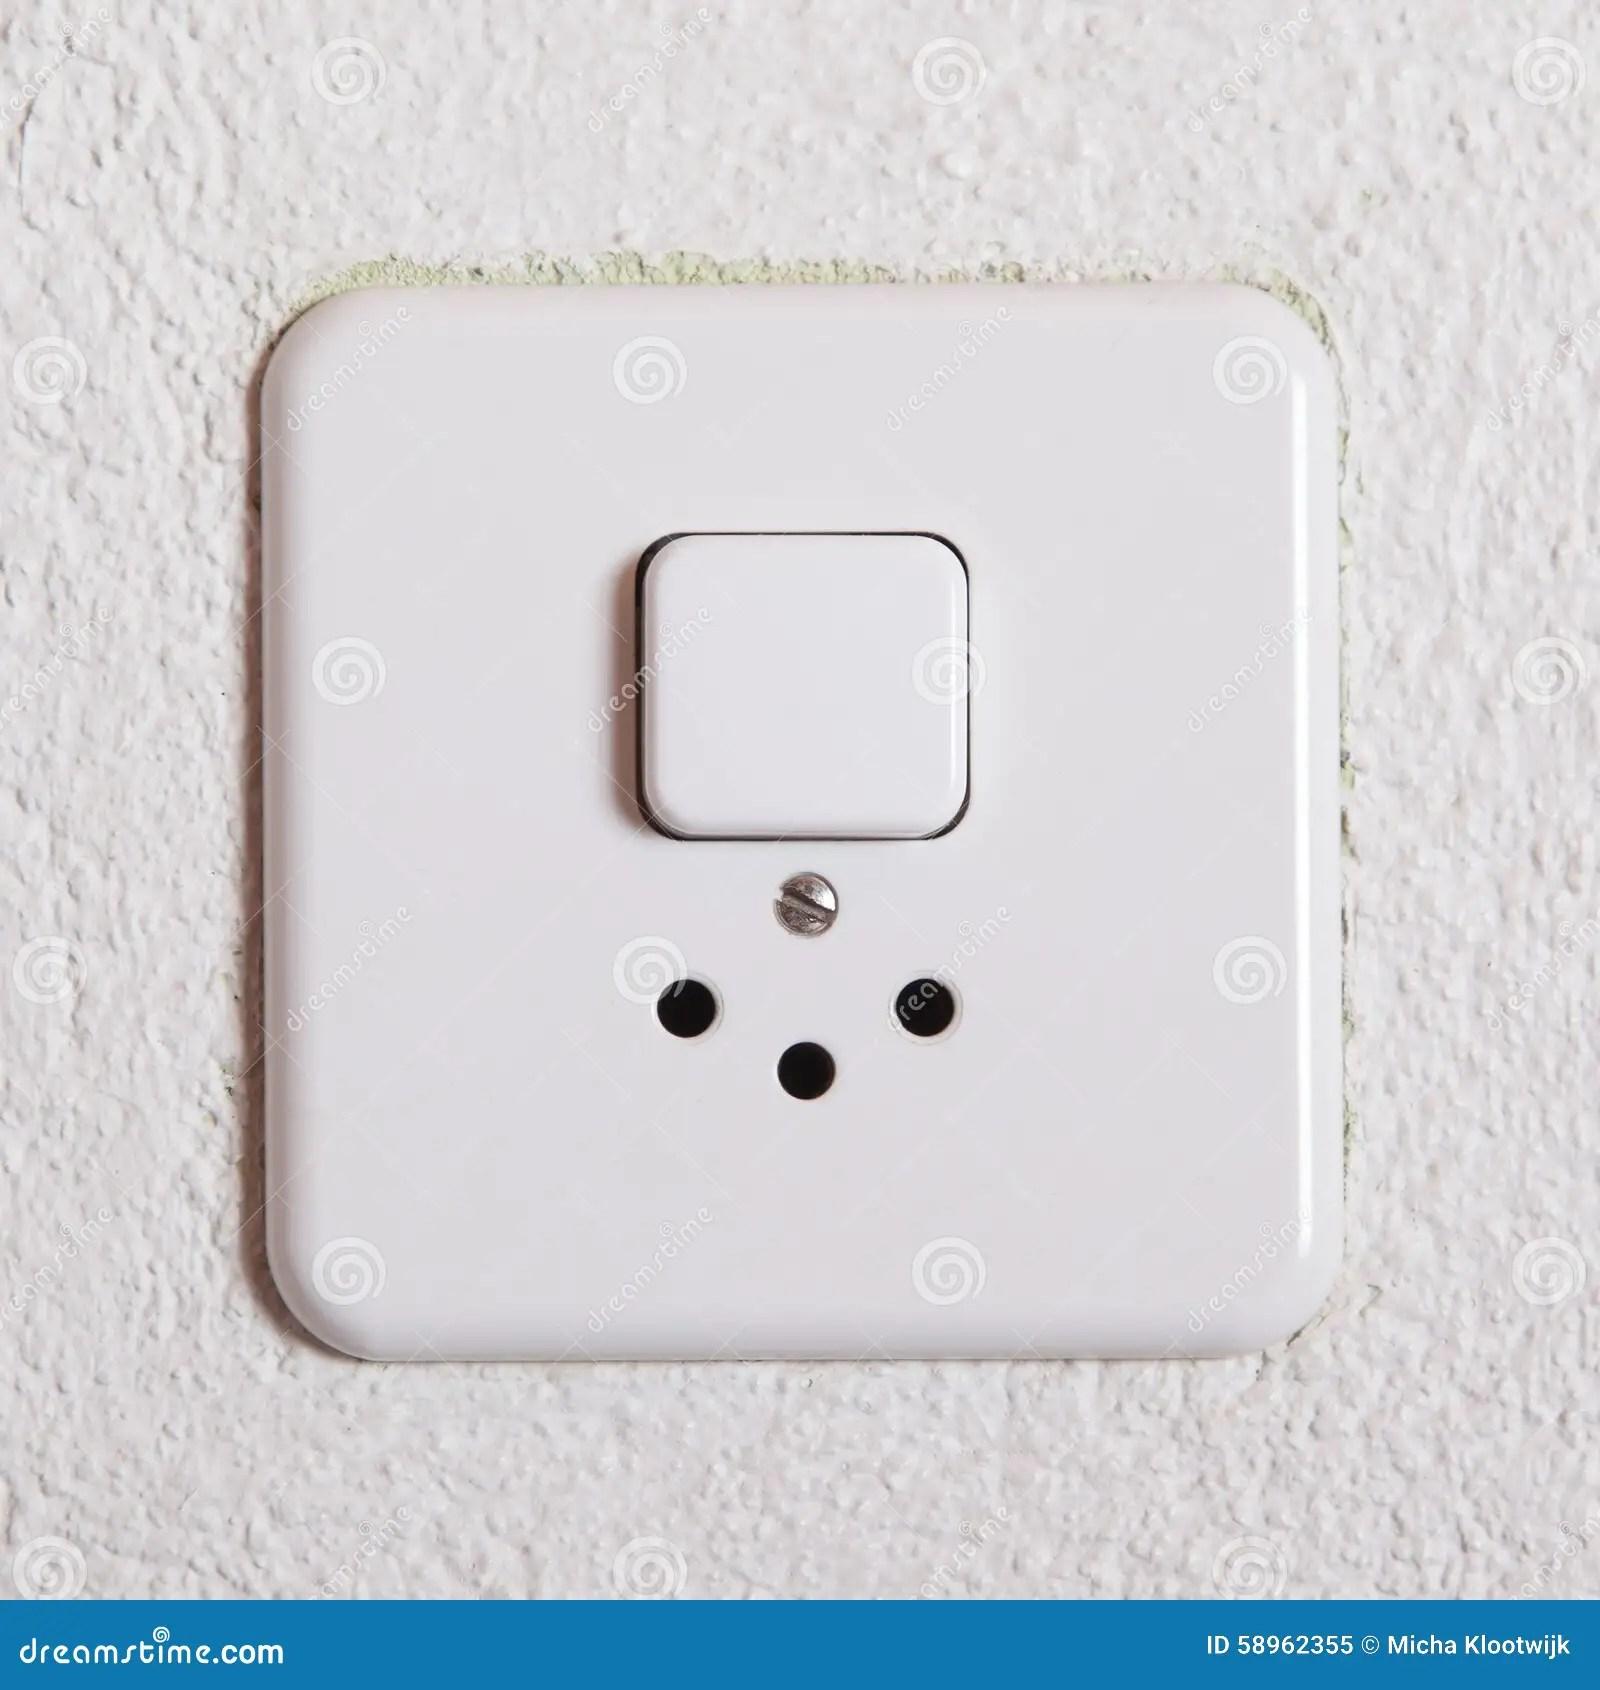 Power Plug Wall Socket